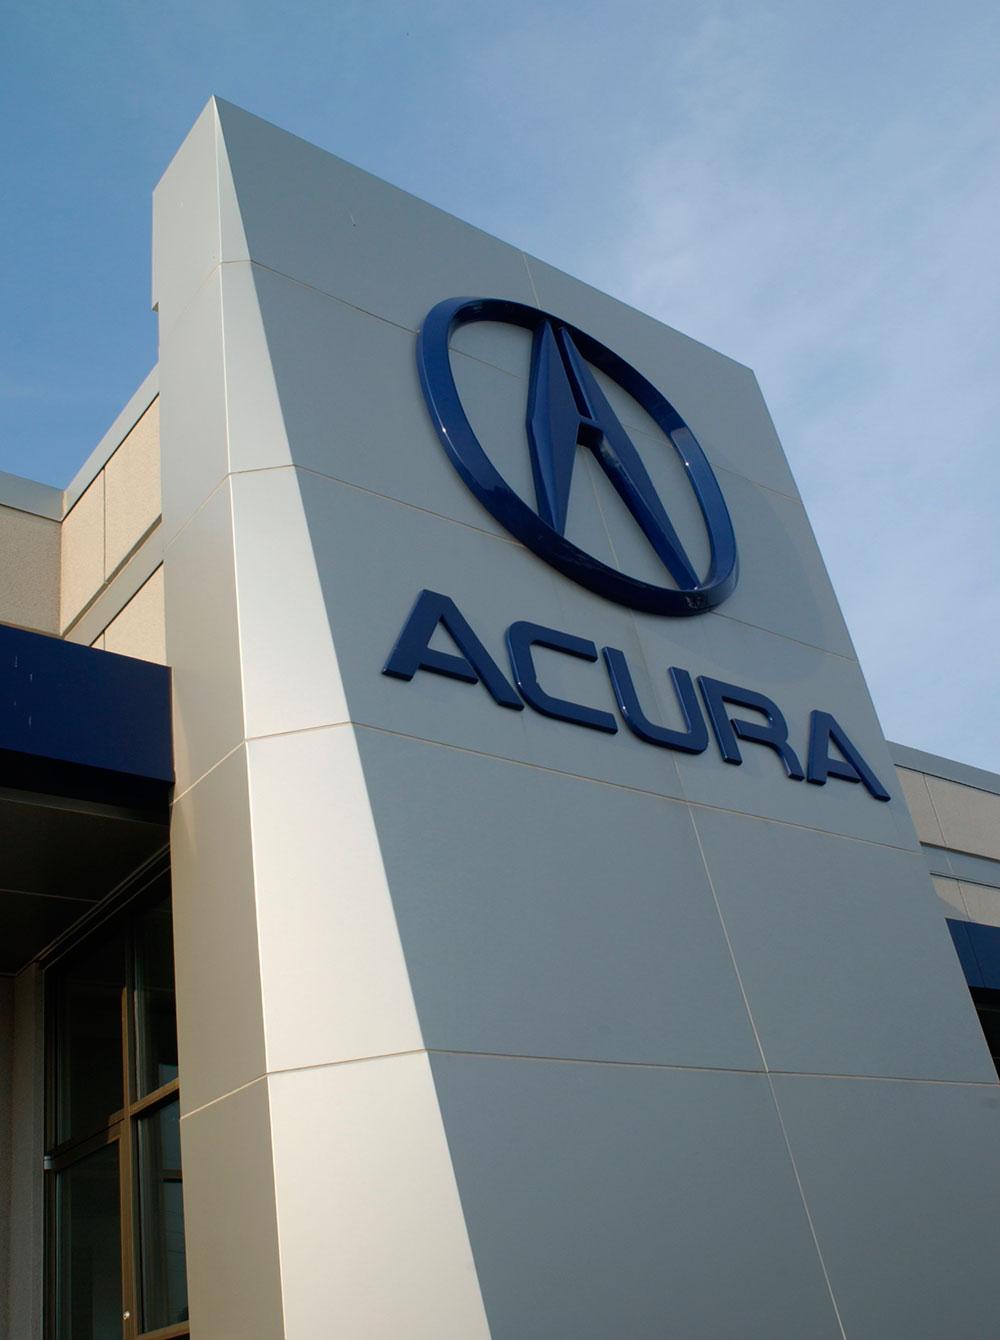 Alucobond, St. Louis Acura, Missouri